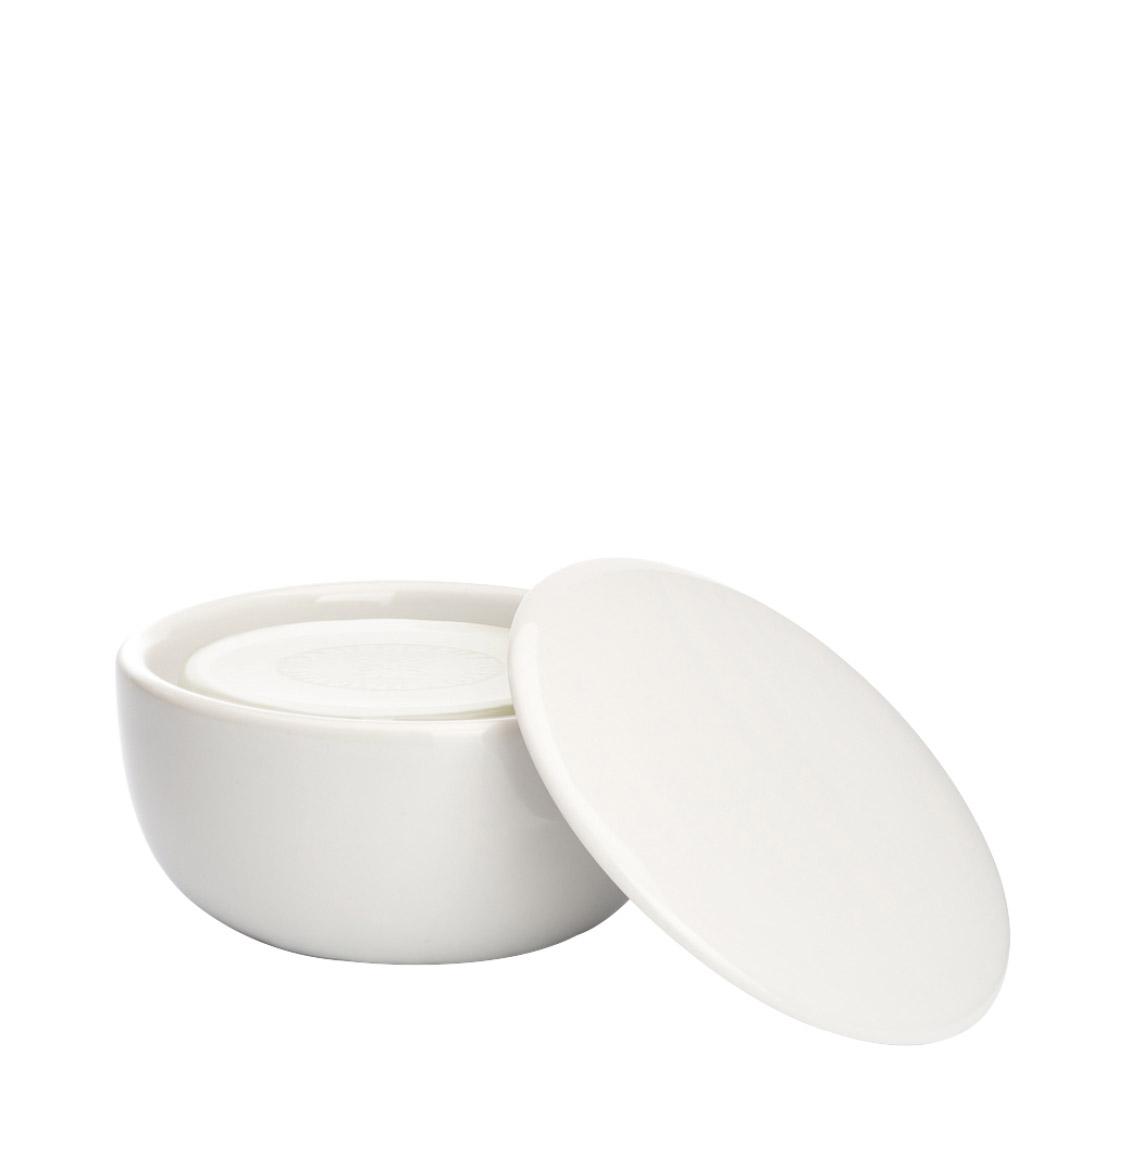 Muhle Aloe Vera Shaving Soap In Porcelain Bowl 65g